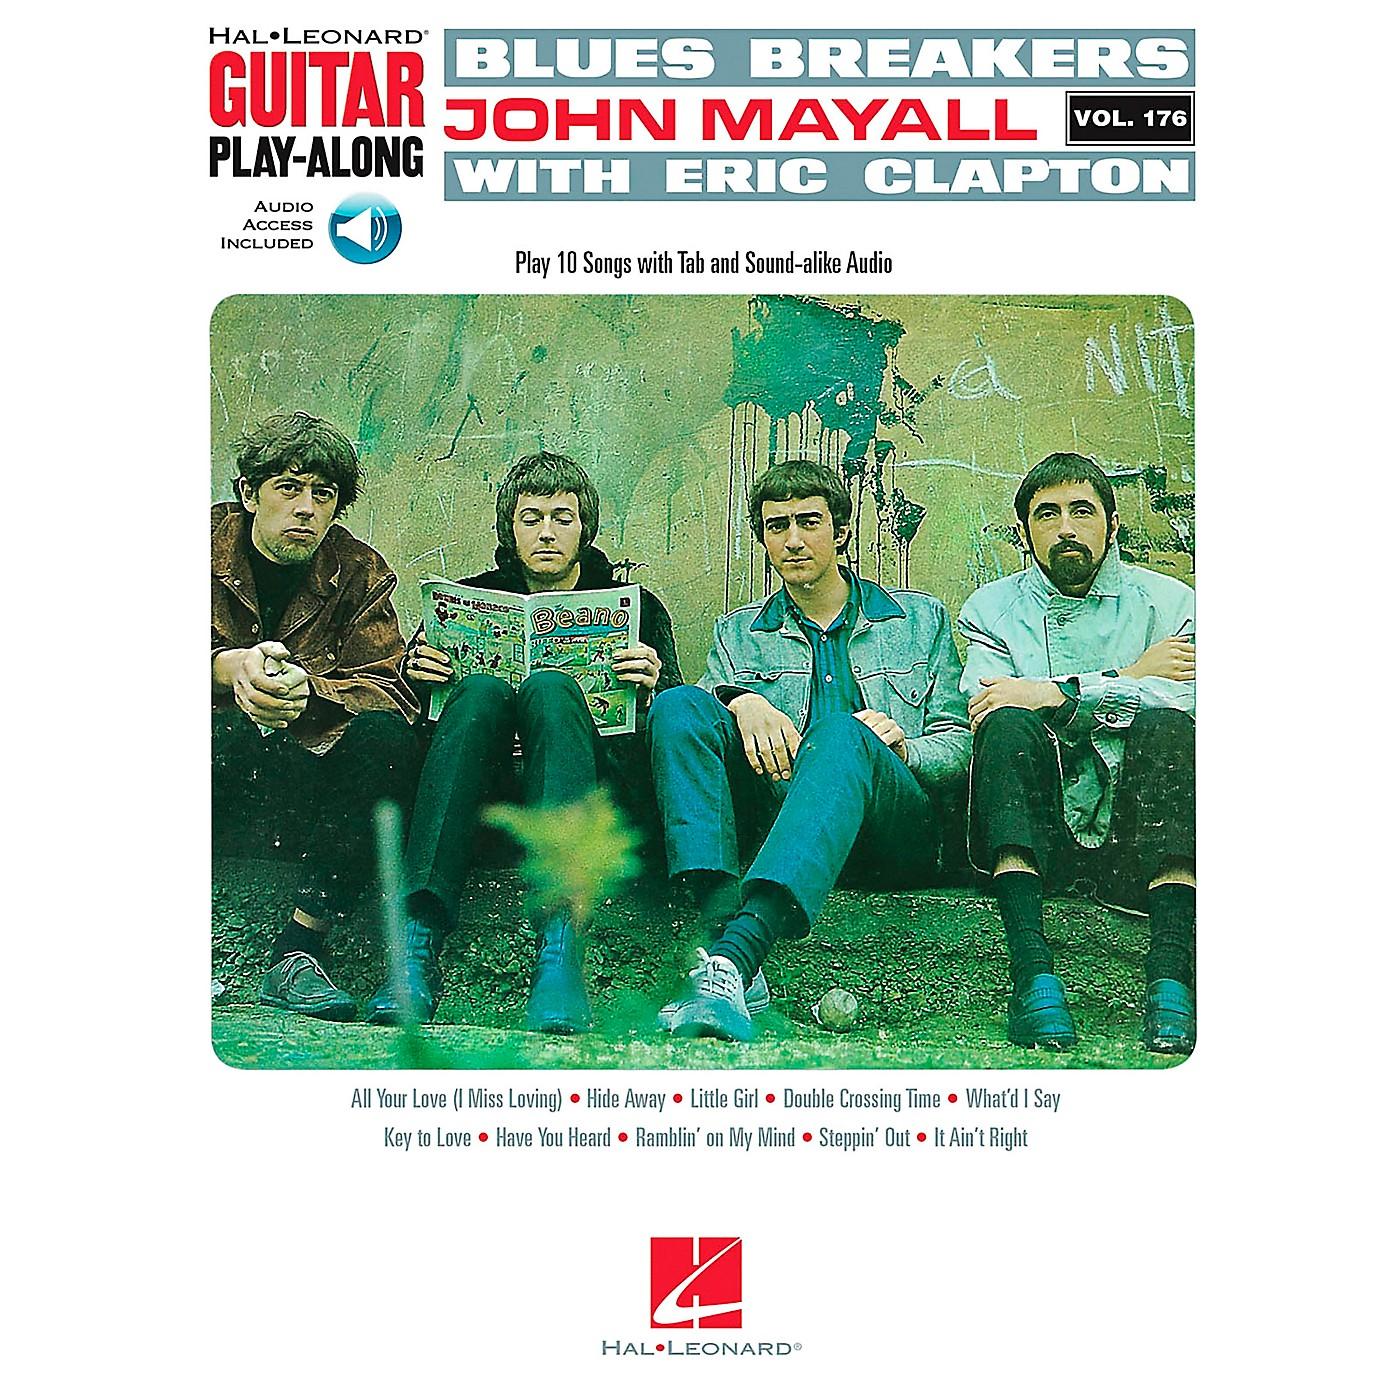 Hal Leonard Blues Breakers With John Mayall & Eric Clapton - Guitar Play-Along Book/CD thumbnail